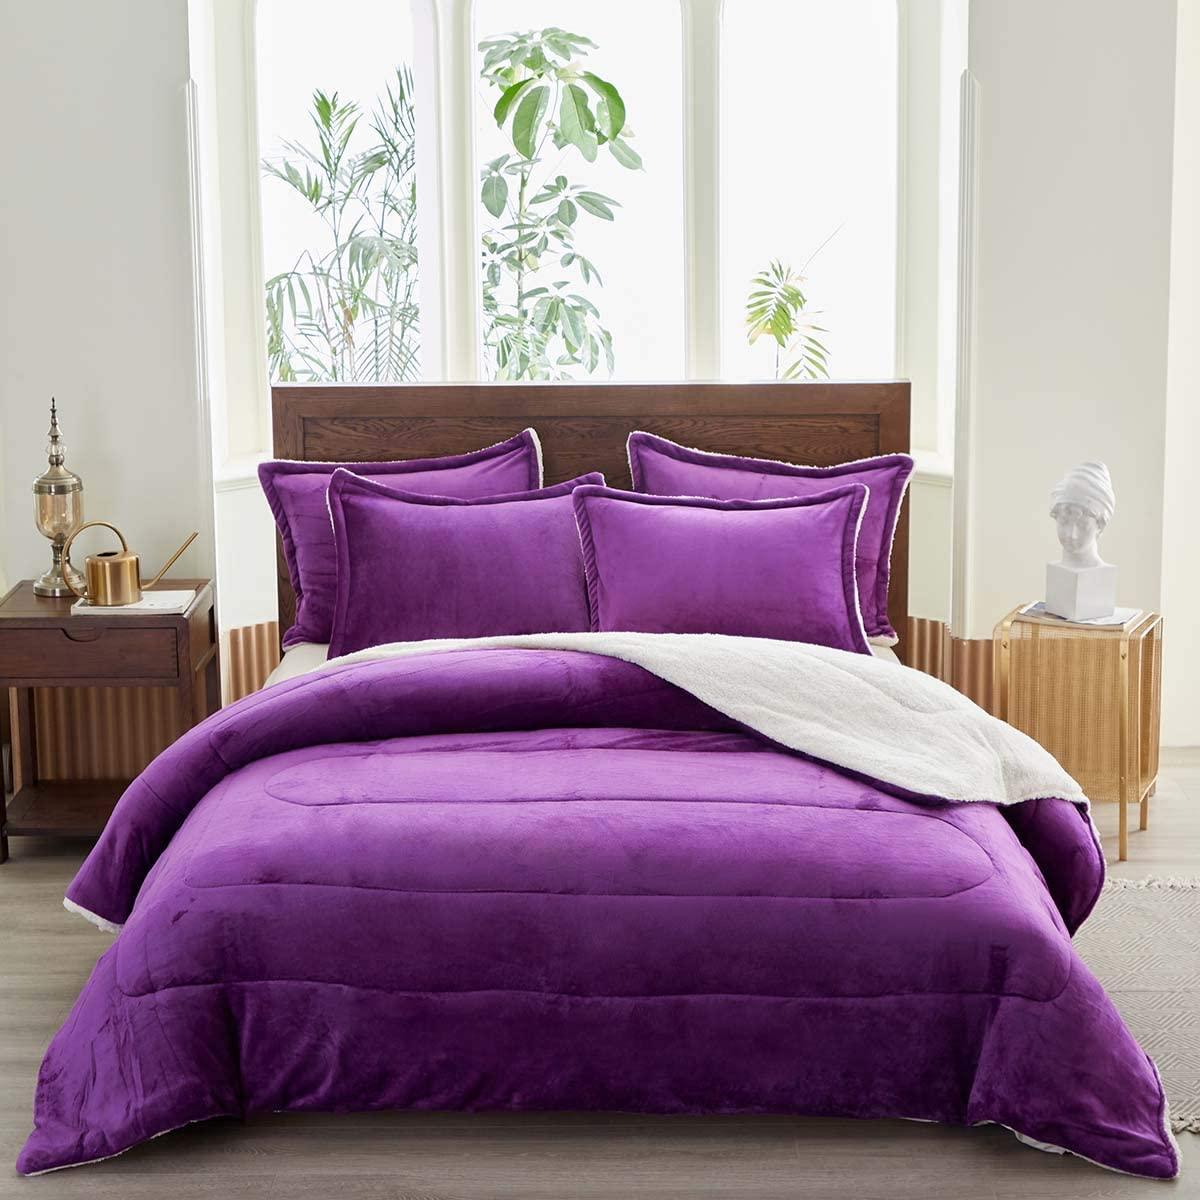 Uozzi Bedding 3-Piece Sherpa Flannel Micromink Comforter Set Ultra-Soft Winter Microfiber Fill Bedding Set Down Alternative Fleece Warm Weighted Duvet with 2 Pillowcase (Purple, King 102